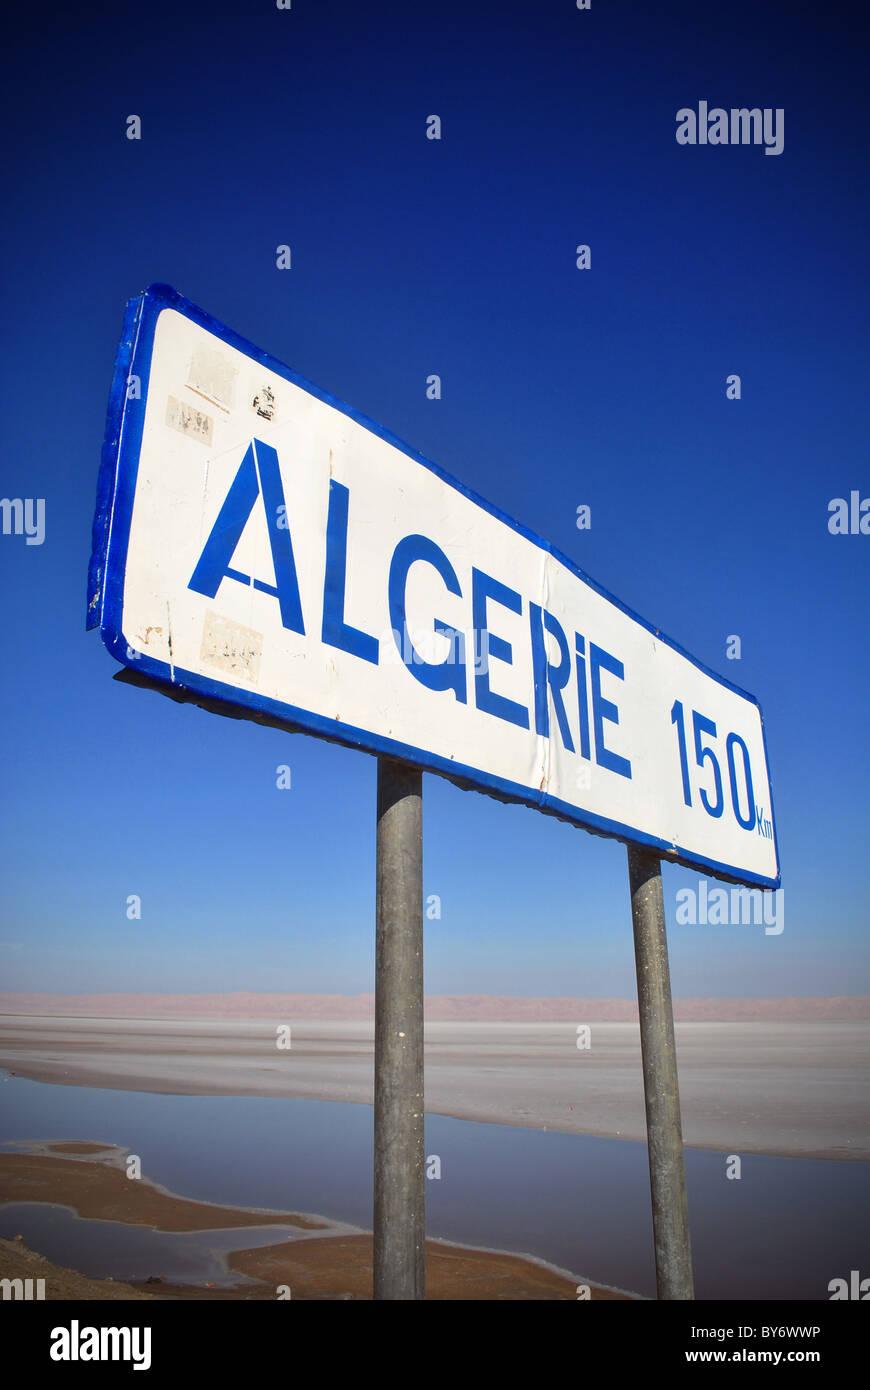 A roadsign on the way to Algeria near Tozeur, Tunisia - Stock Image